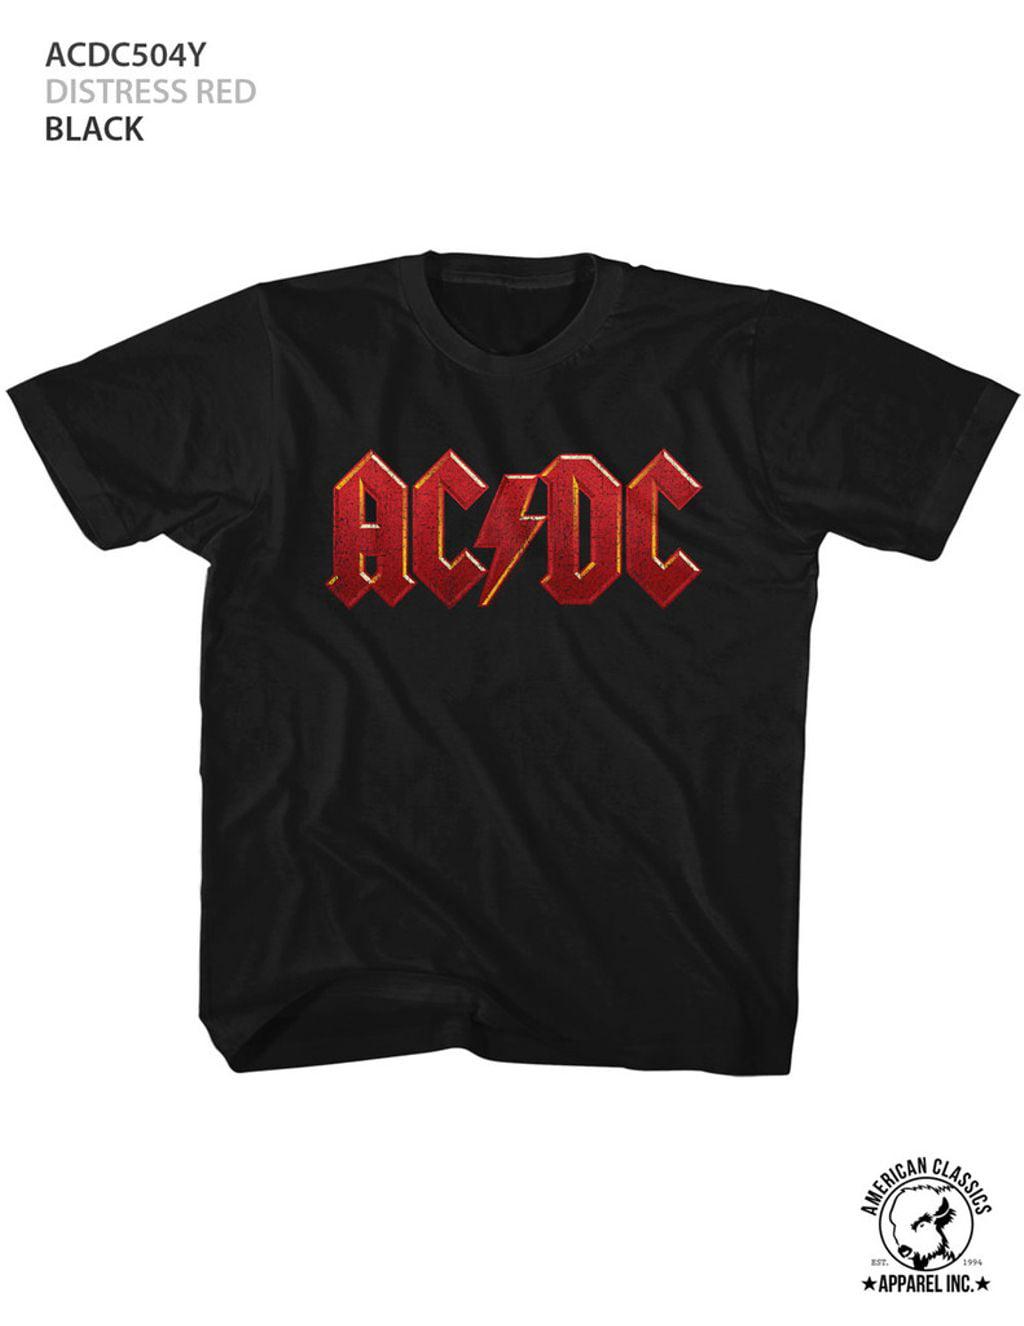 American Classics ACDC DISTRESS RED Black Child Unisex T-Shirt